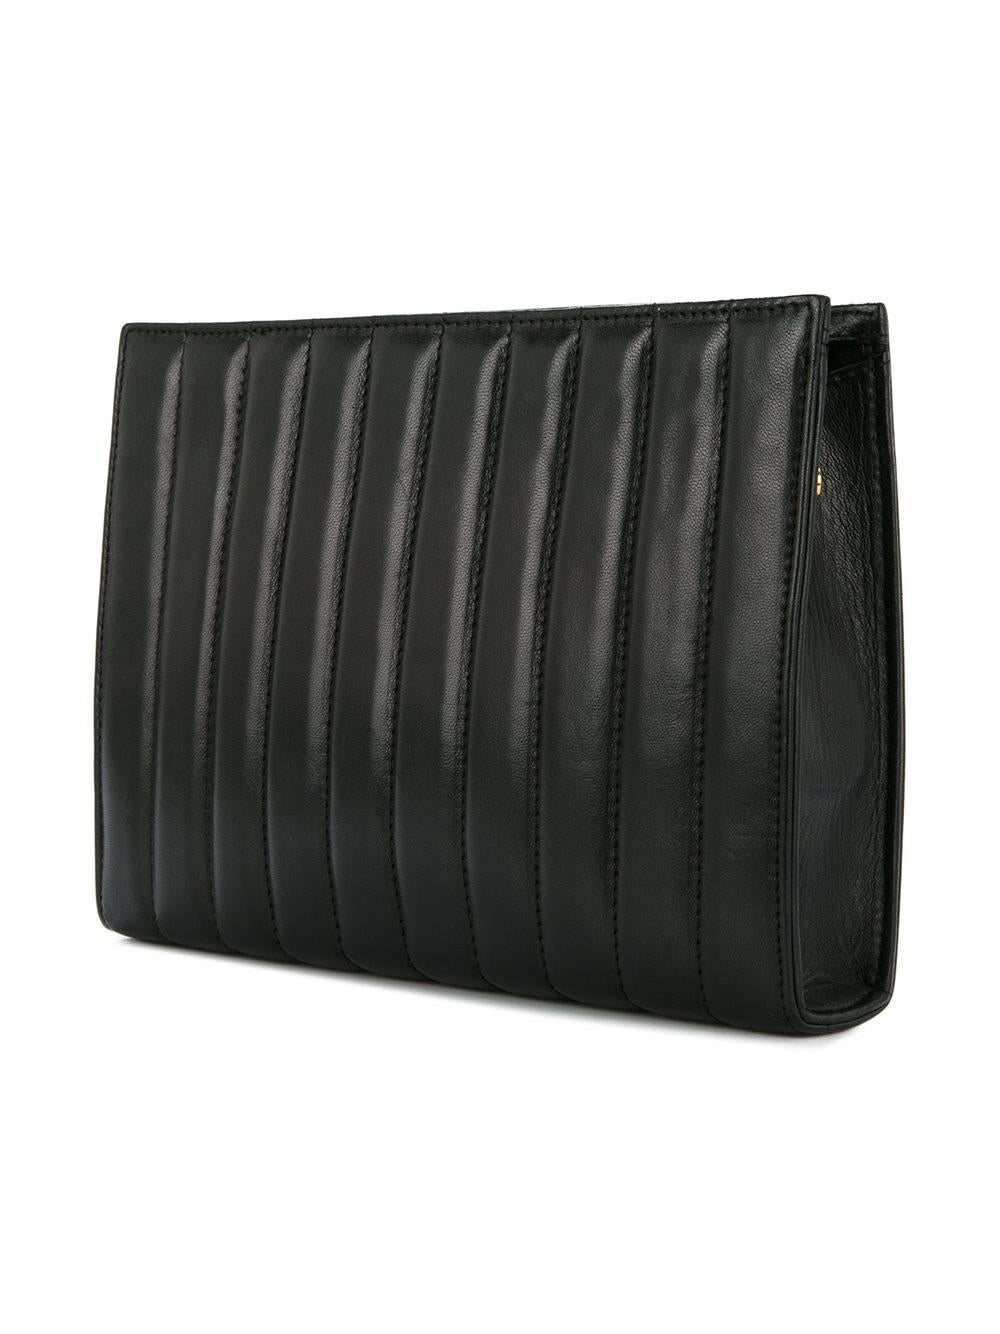 Fendi Black Leather Chocolate Bar Envelope Evening Clutch Bag With Dust Bag Uw71GEgT